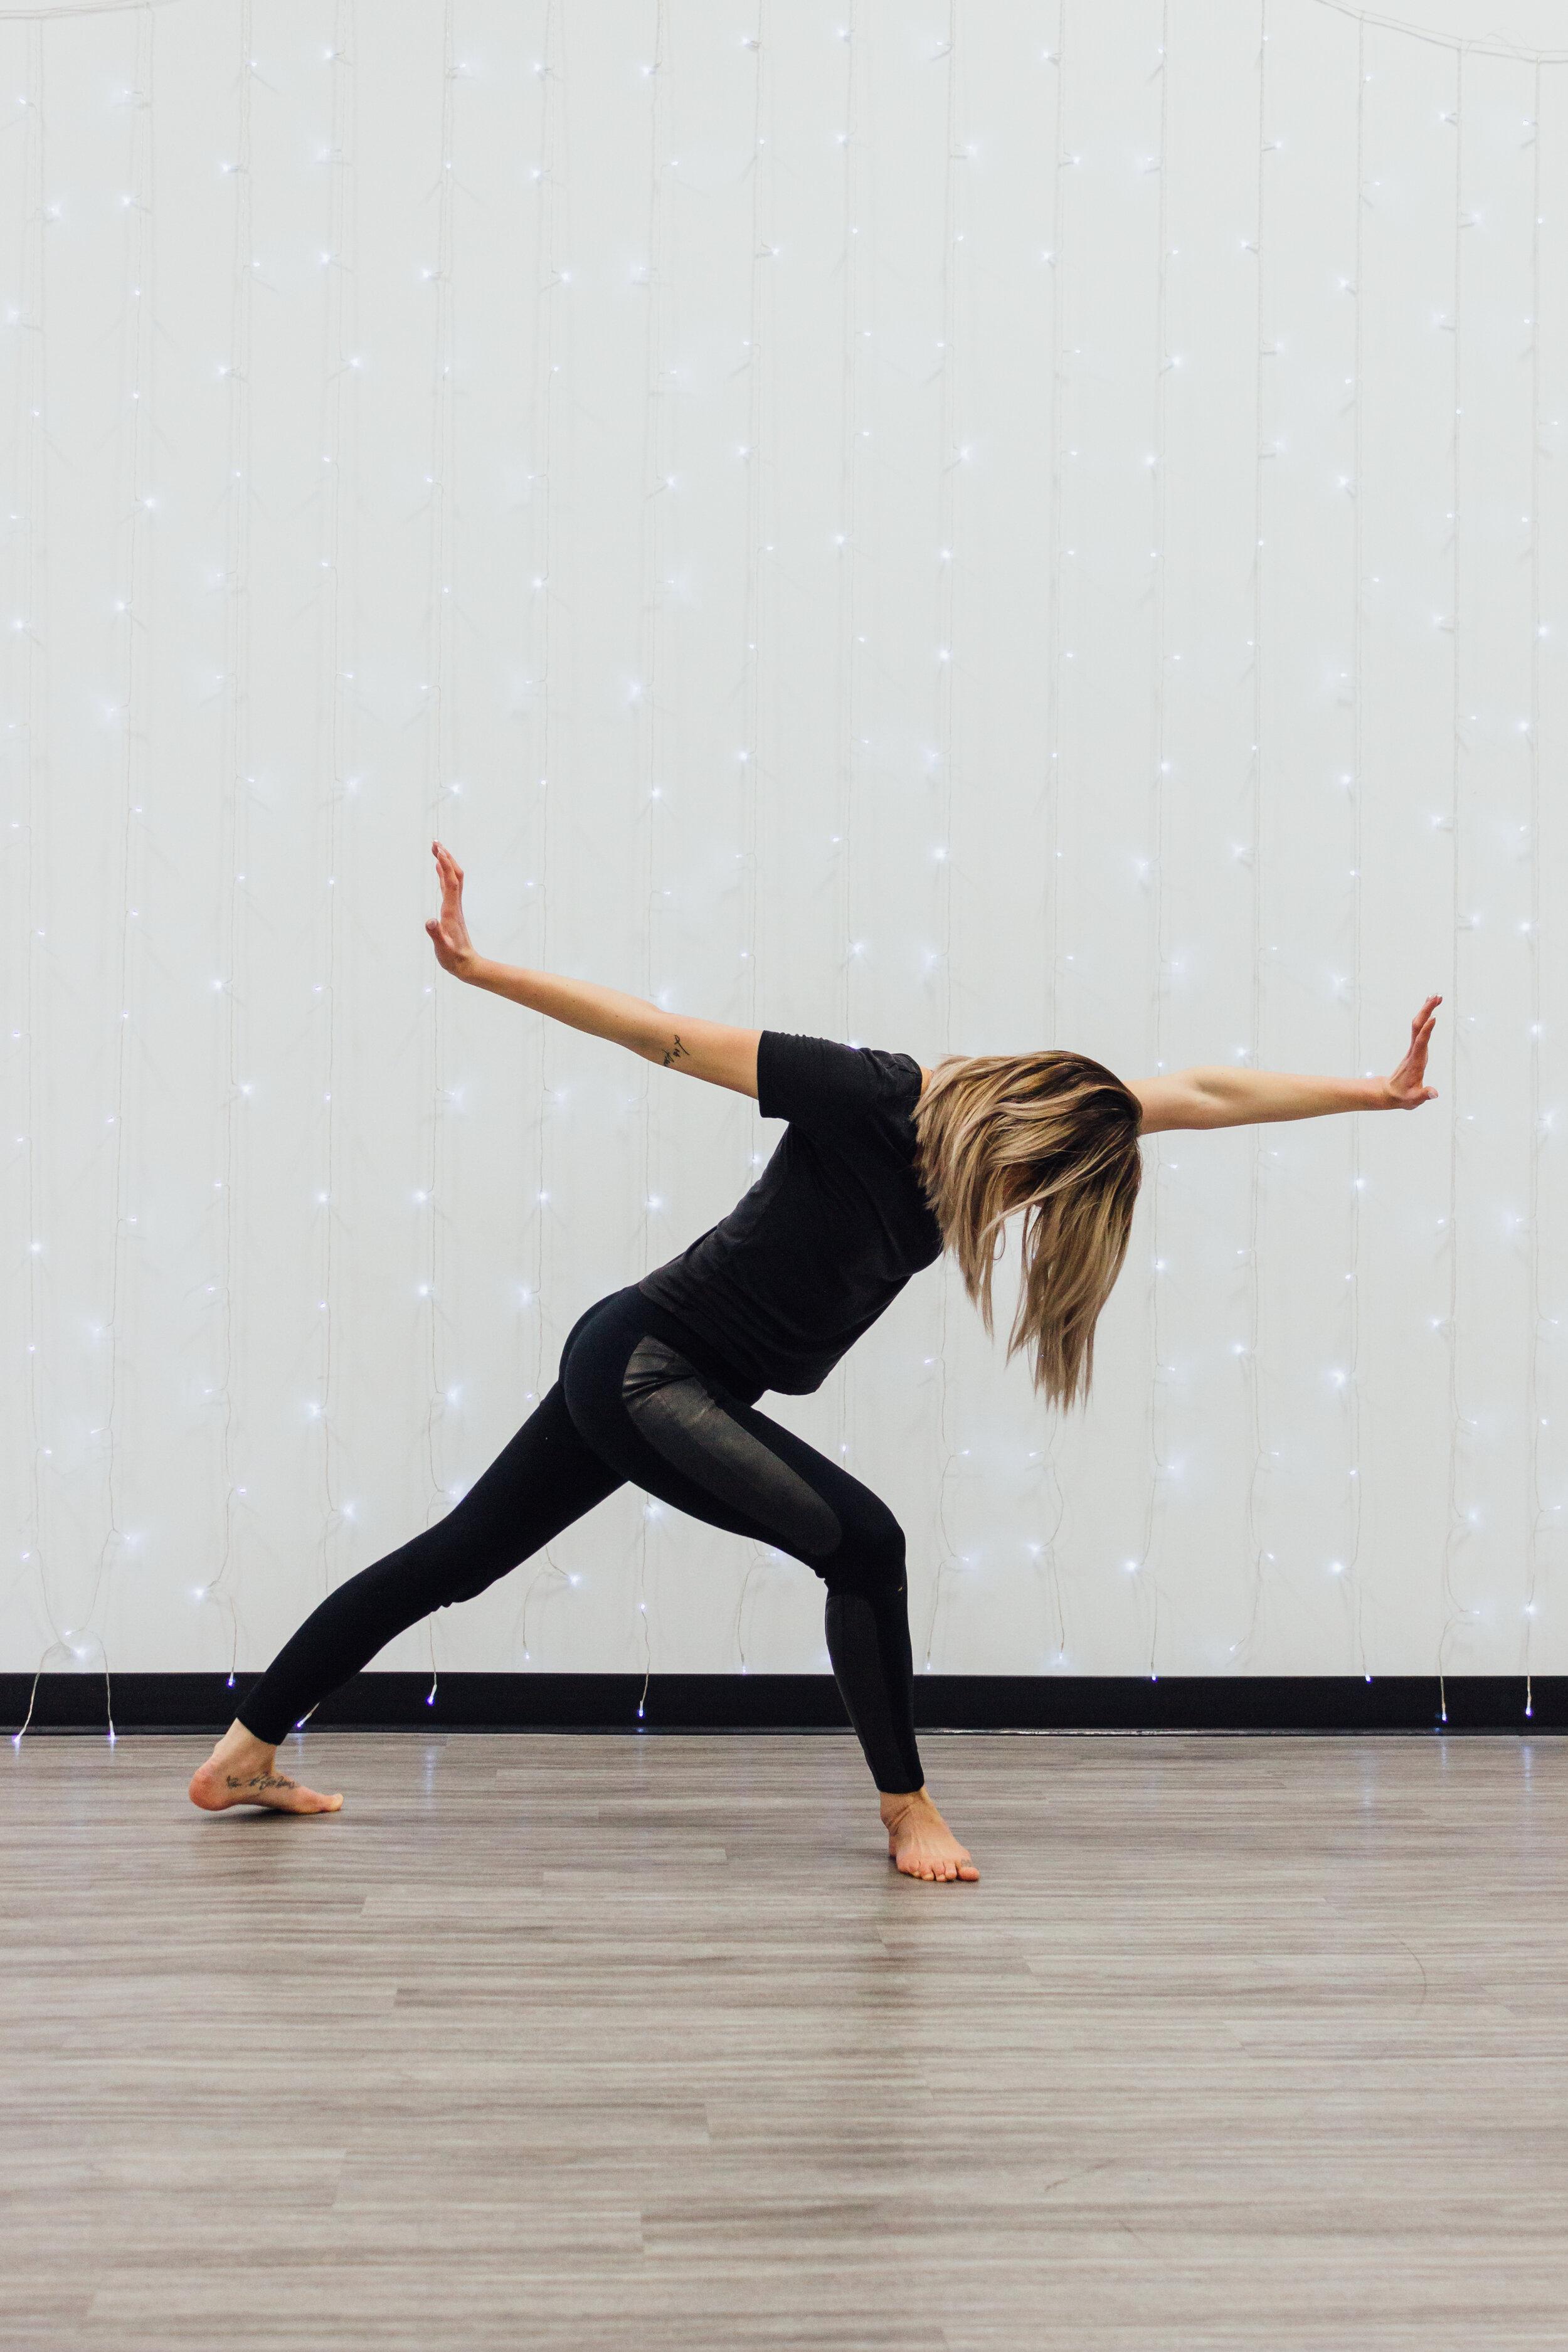 Twerk Dance Classes Near Me : twerk, dance, classes, Dance, SASKATOON, DANCE, STUDIO